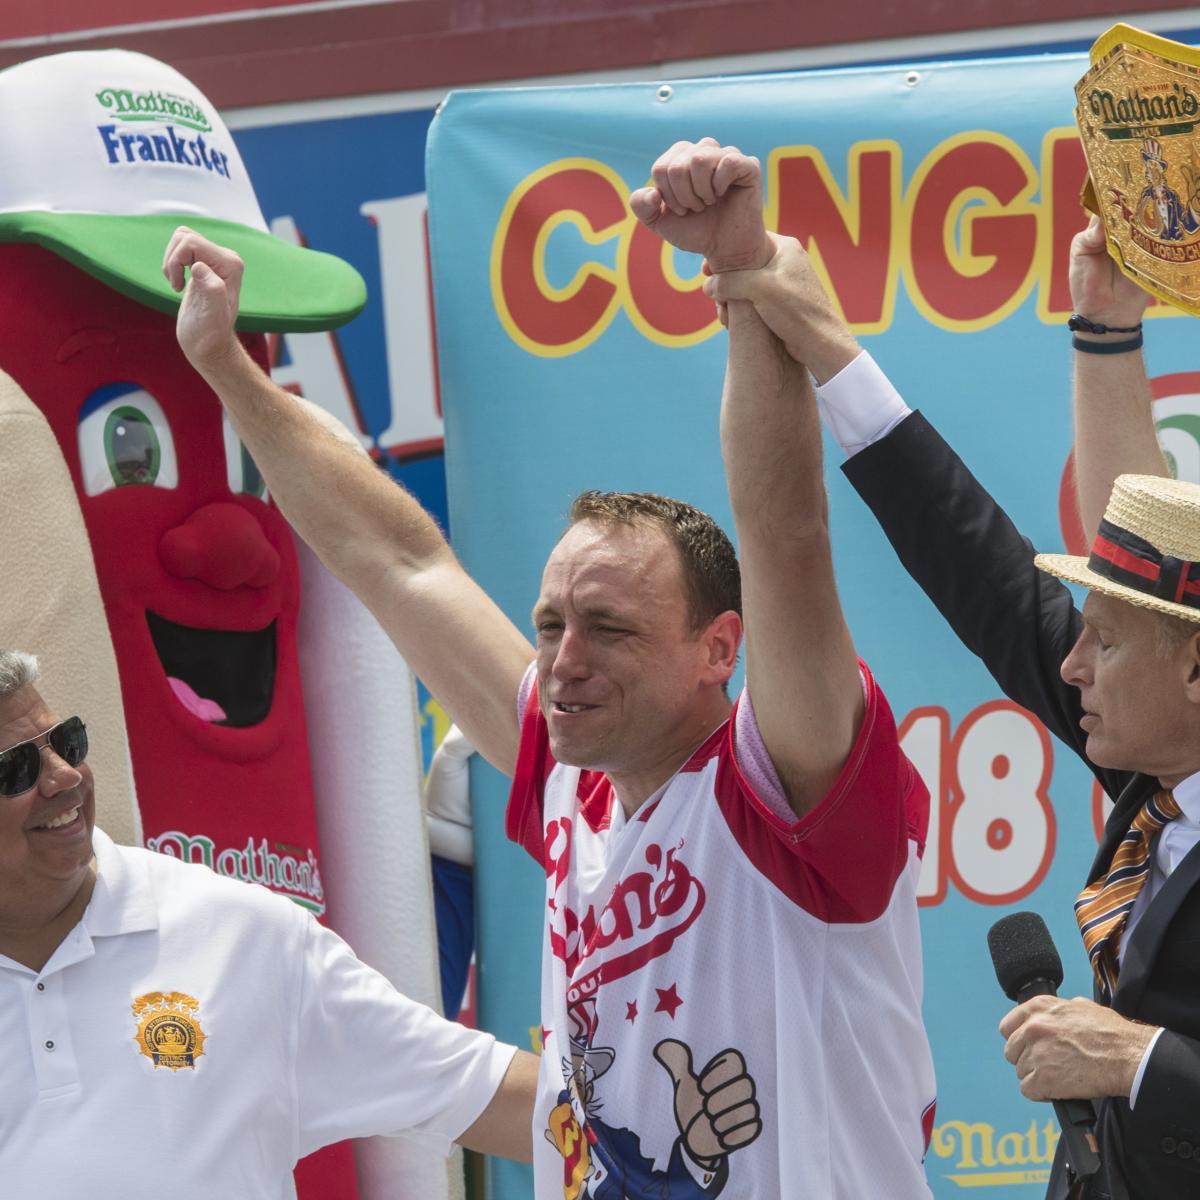 Hot Dog Contest Prize Money